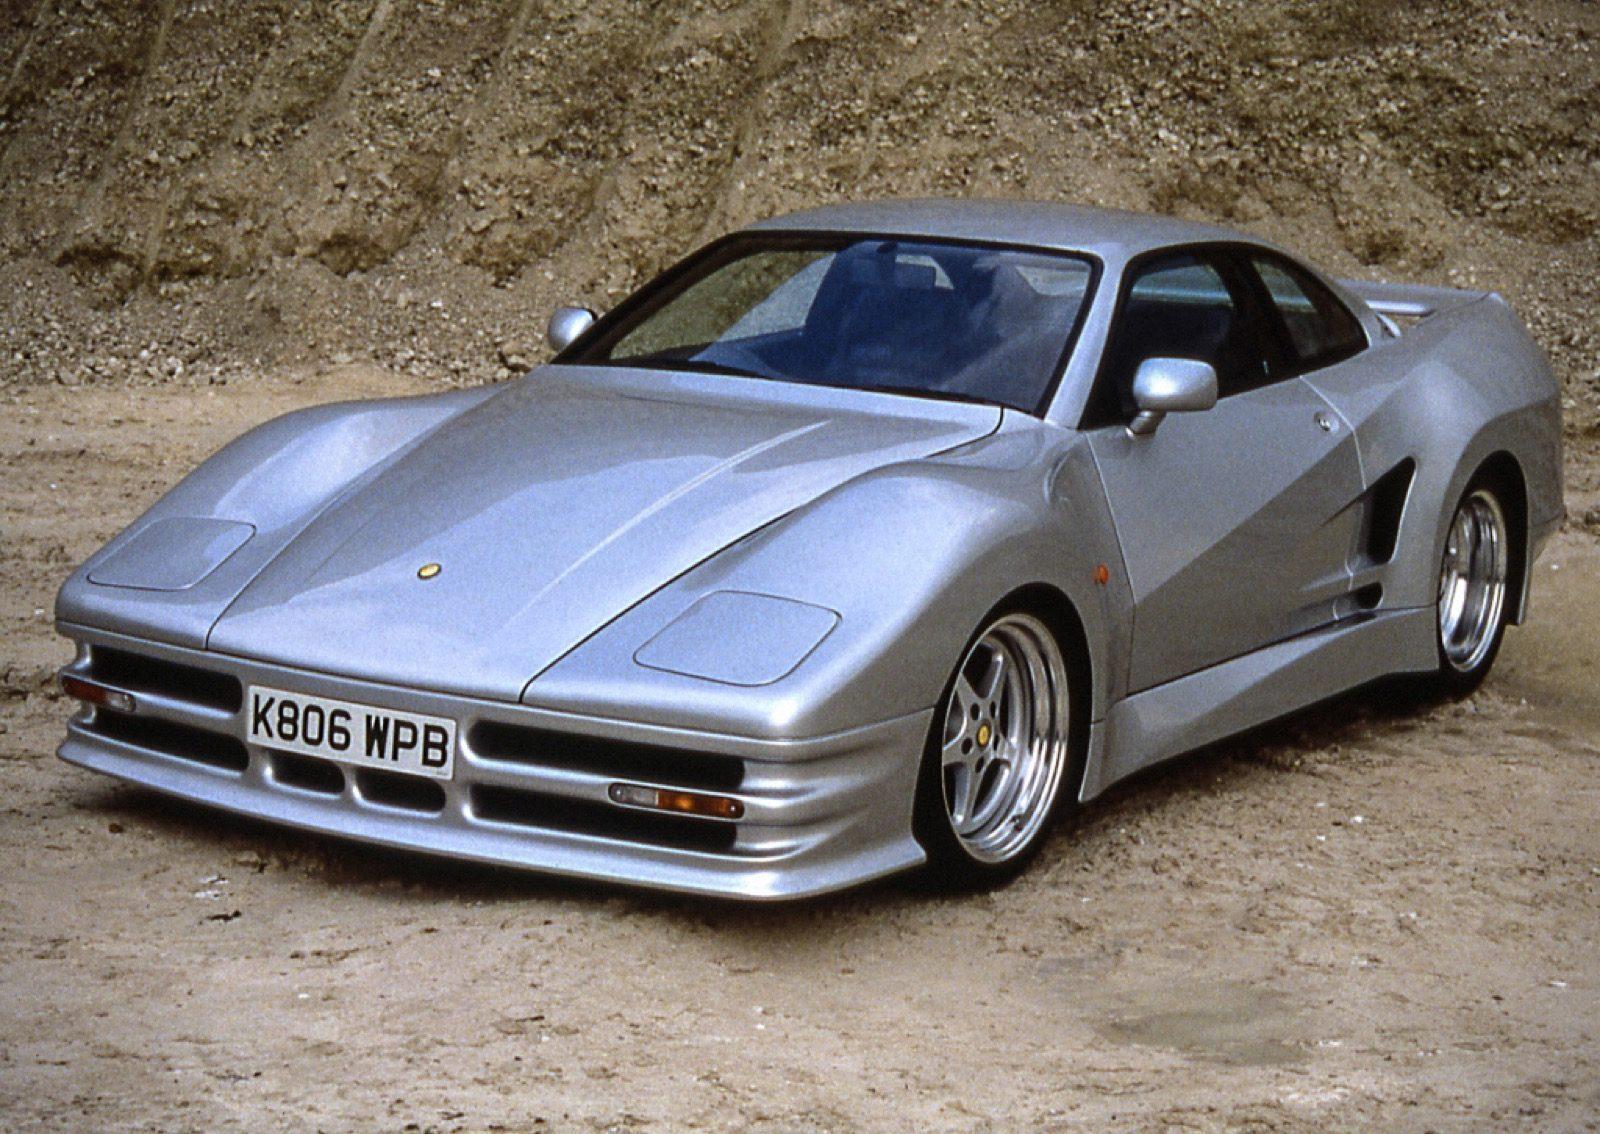 jaren '90 supercars - Lister Storm